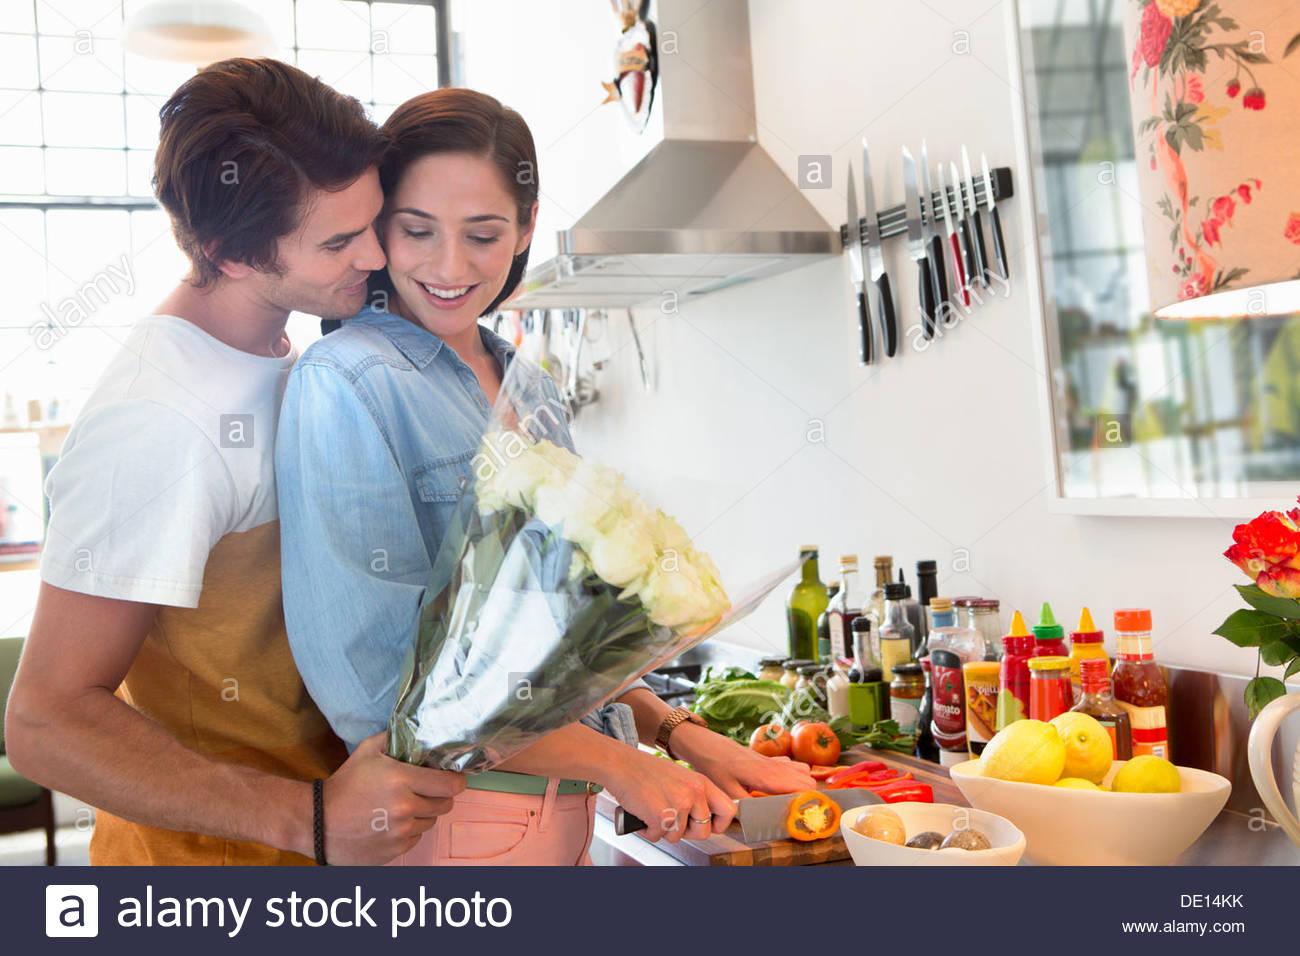 Hombre Mujer sorprendente en cocina con bouquet de flores Imagen De Stock